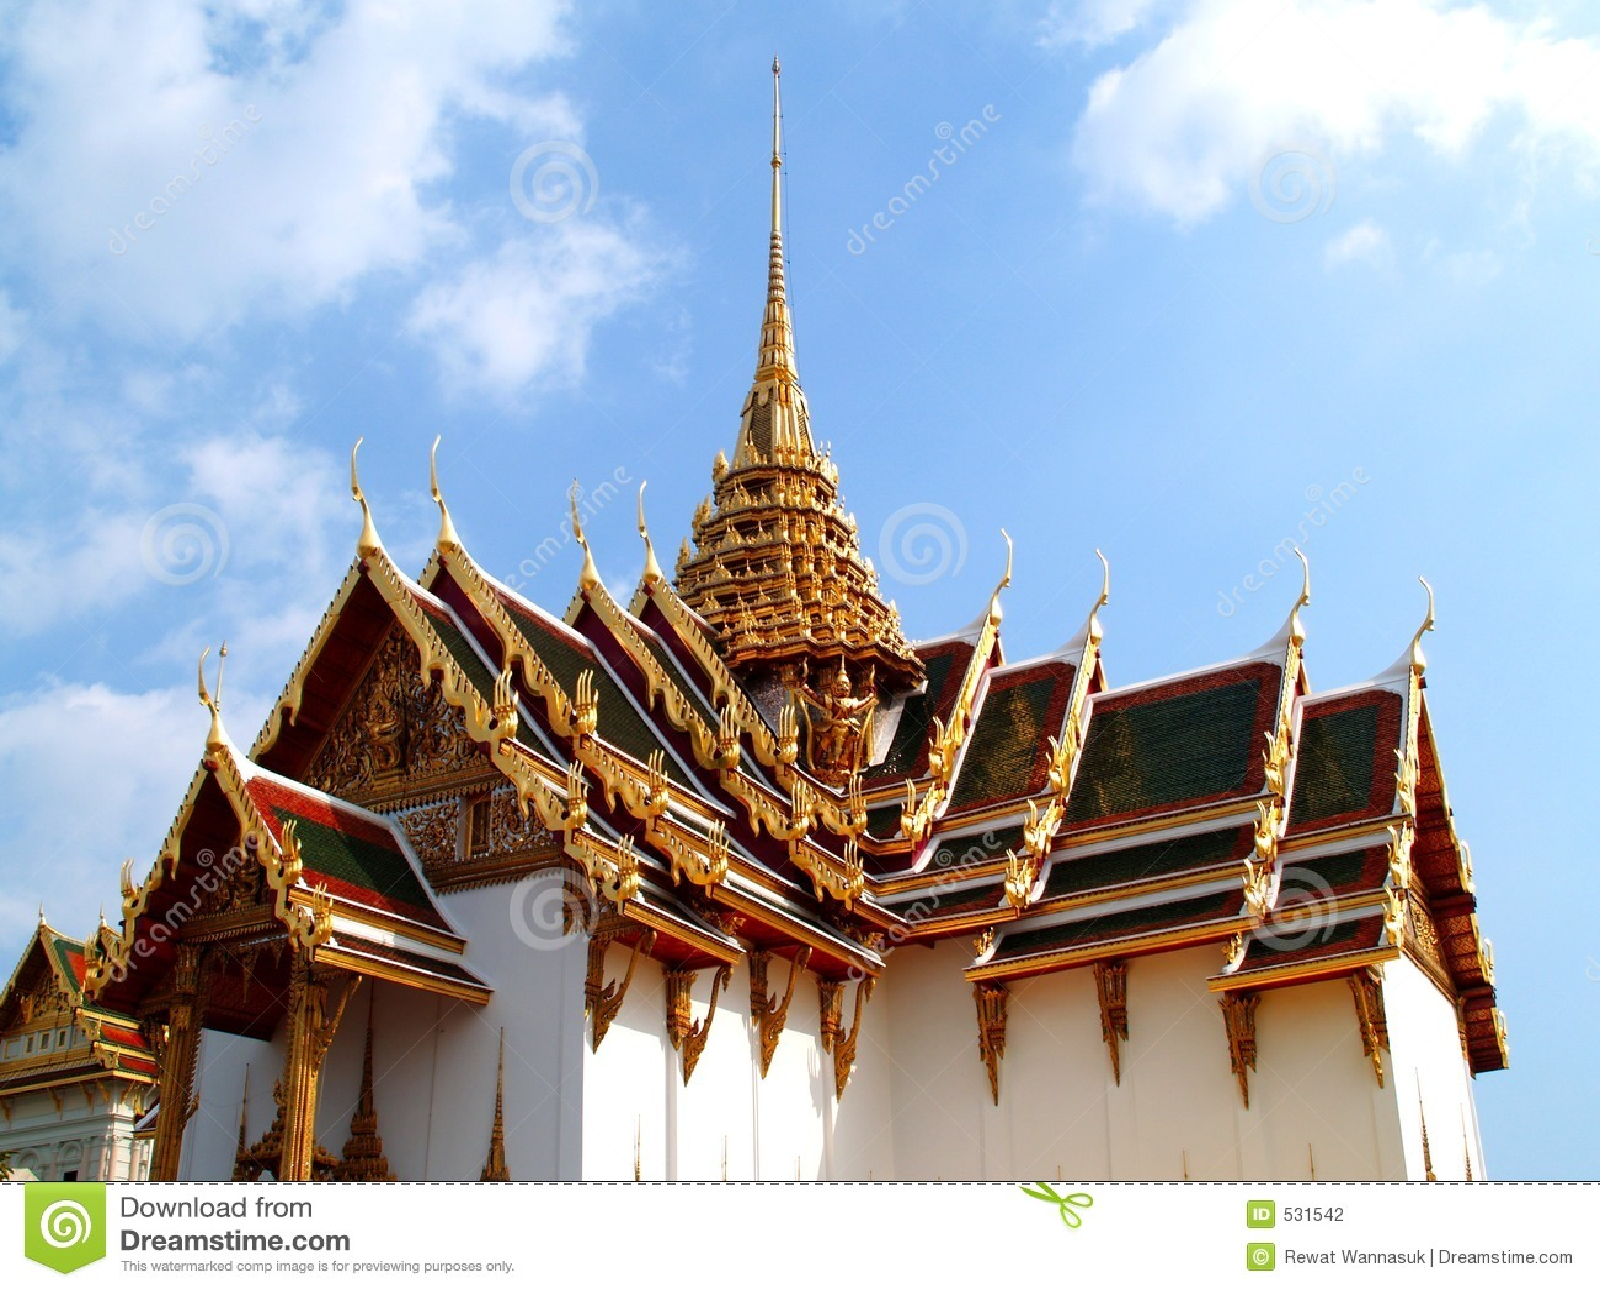 Download 结构样式泰国 库存照片. 图片 包括有 旅游业, 金子, 放松, 佛教, 发芽, 聚会所, 朝代, 崇拜, 神象 - 531542